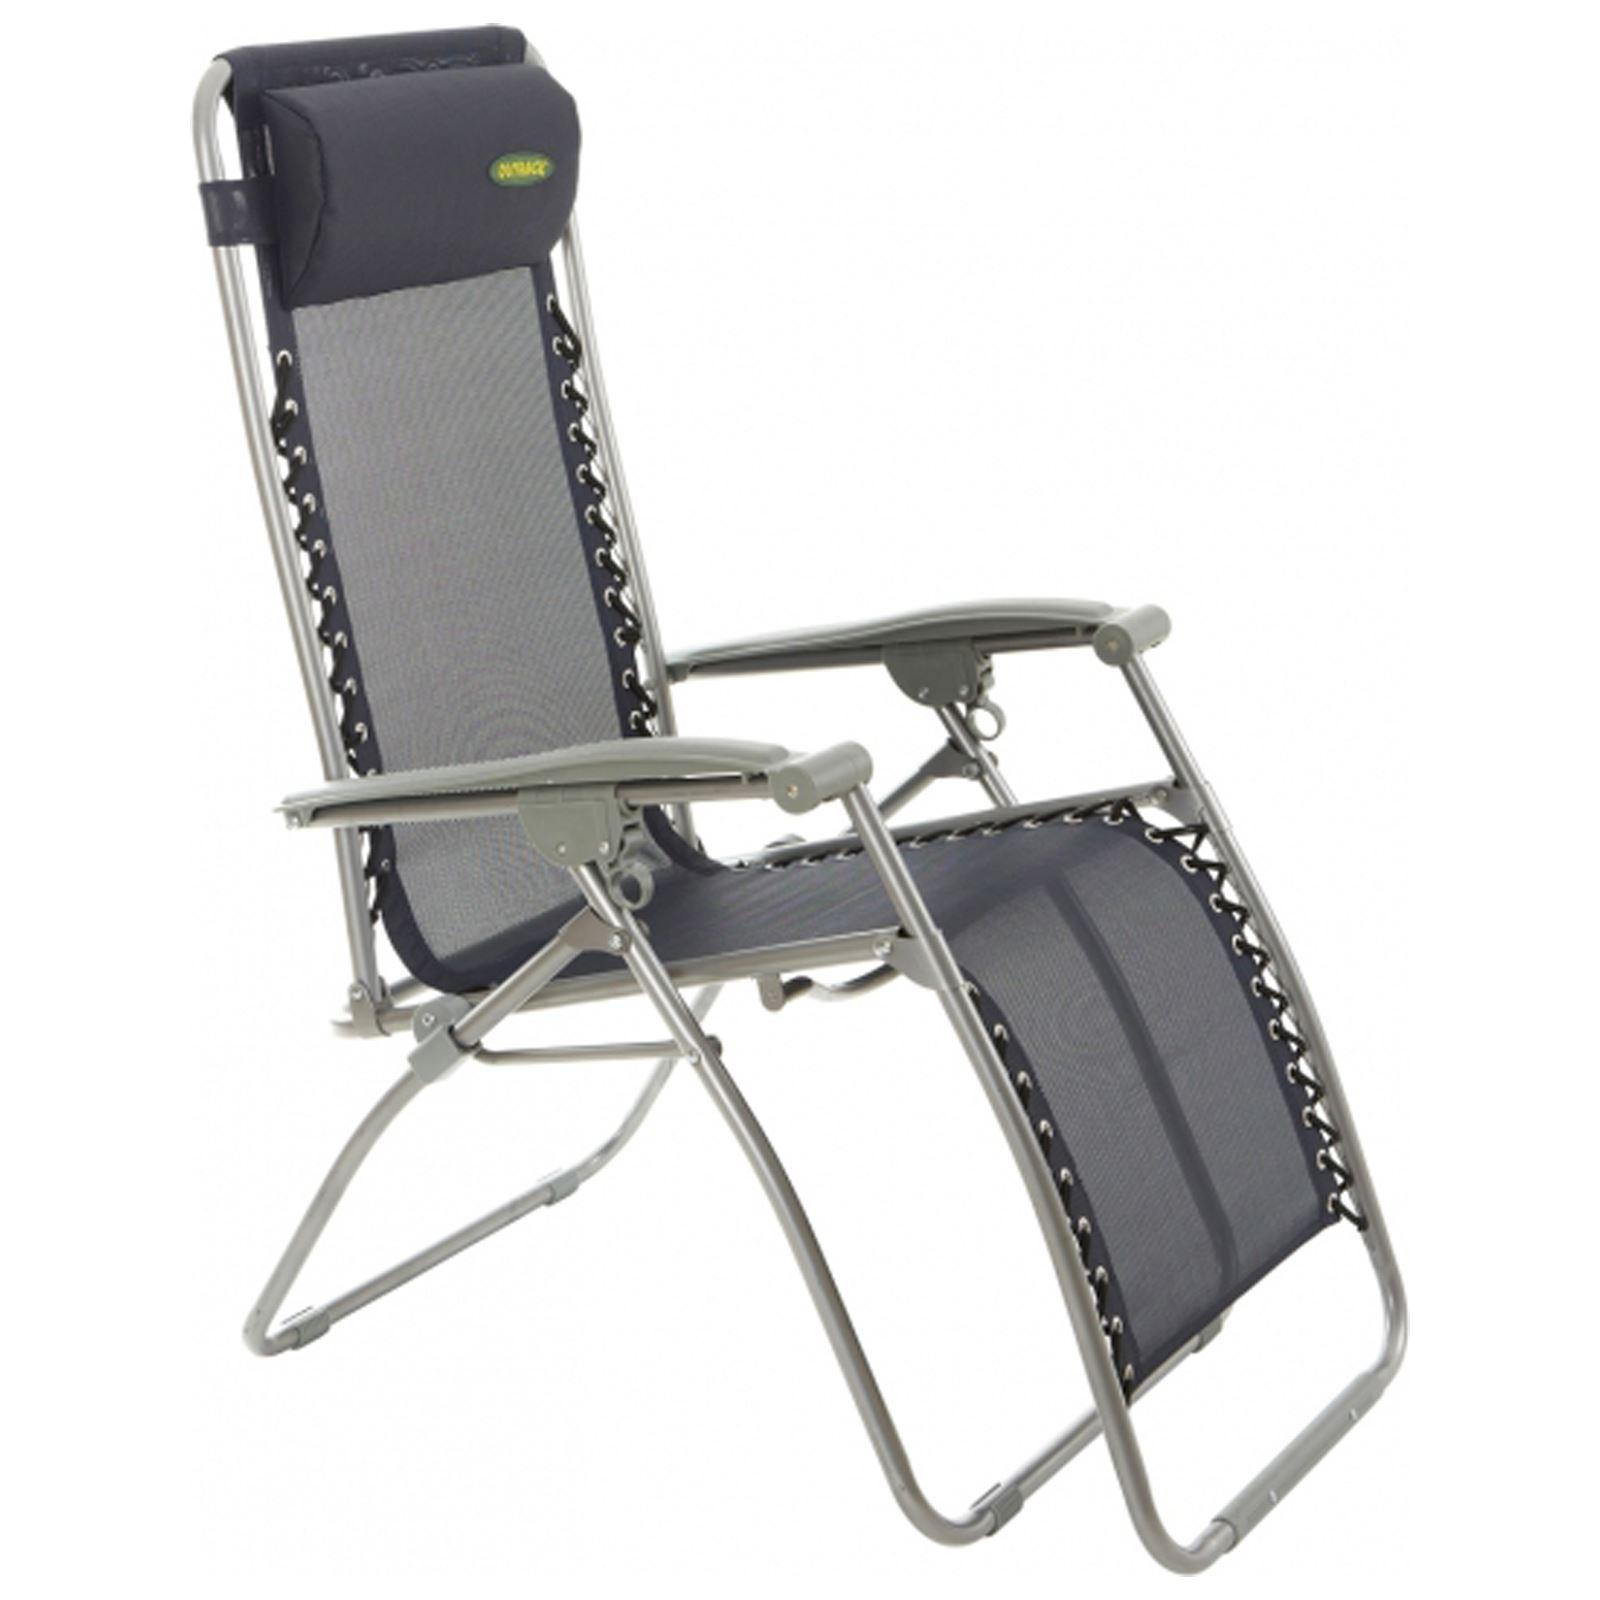 Outback blue textilene recliner folding gravity chair garden camping